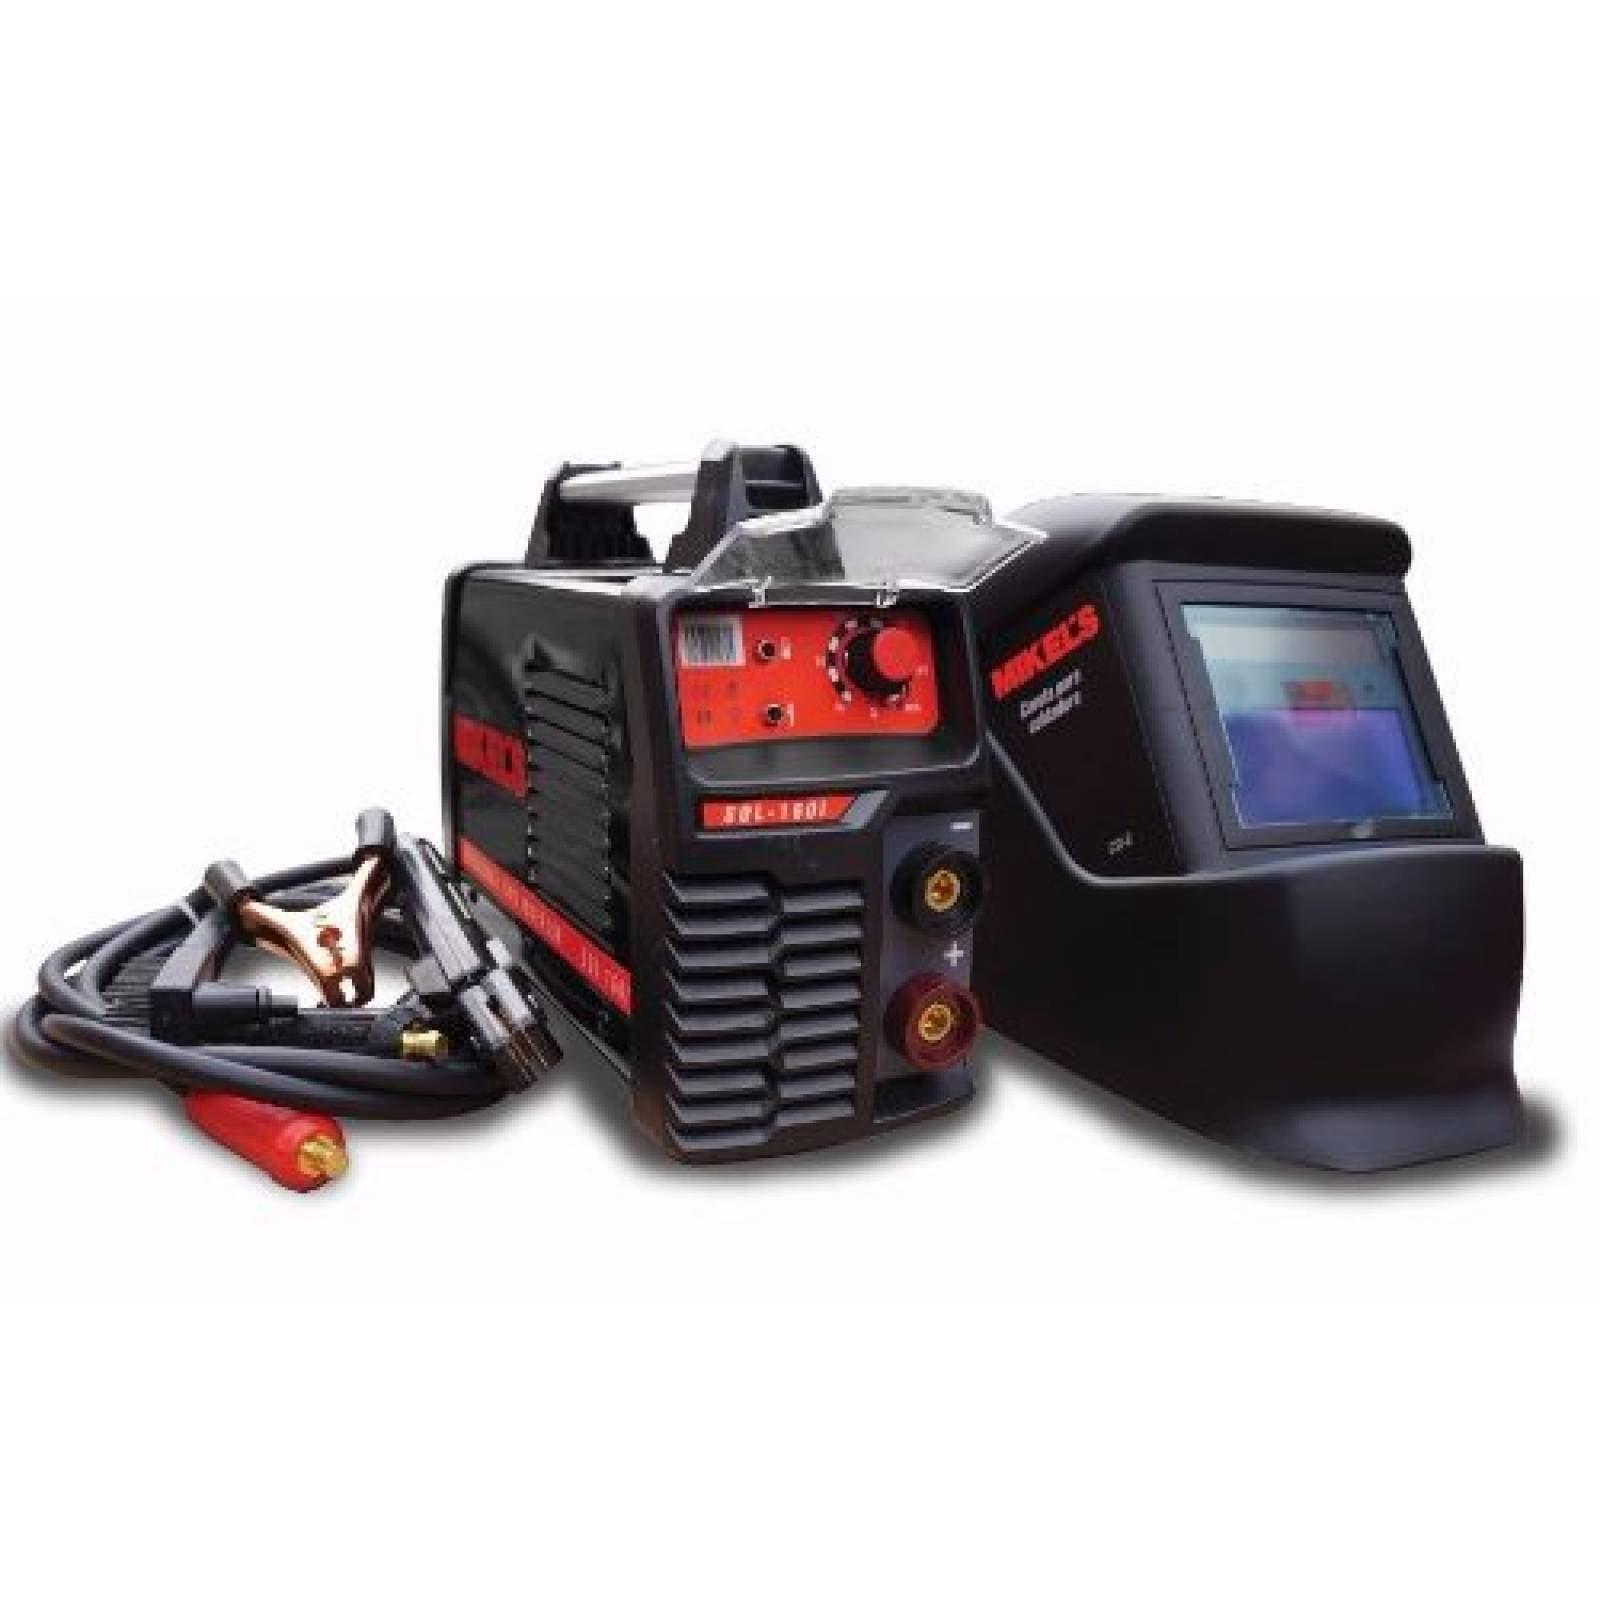 Kit Soldadora Tipo Inversor 160 Amperes + Careta + Cables Mikels